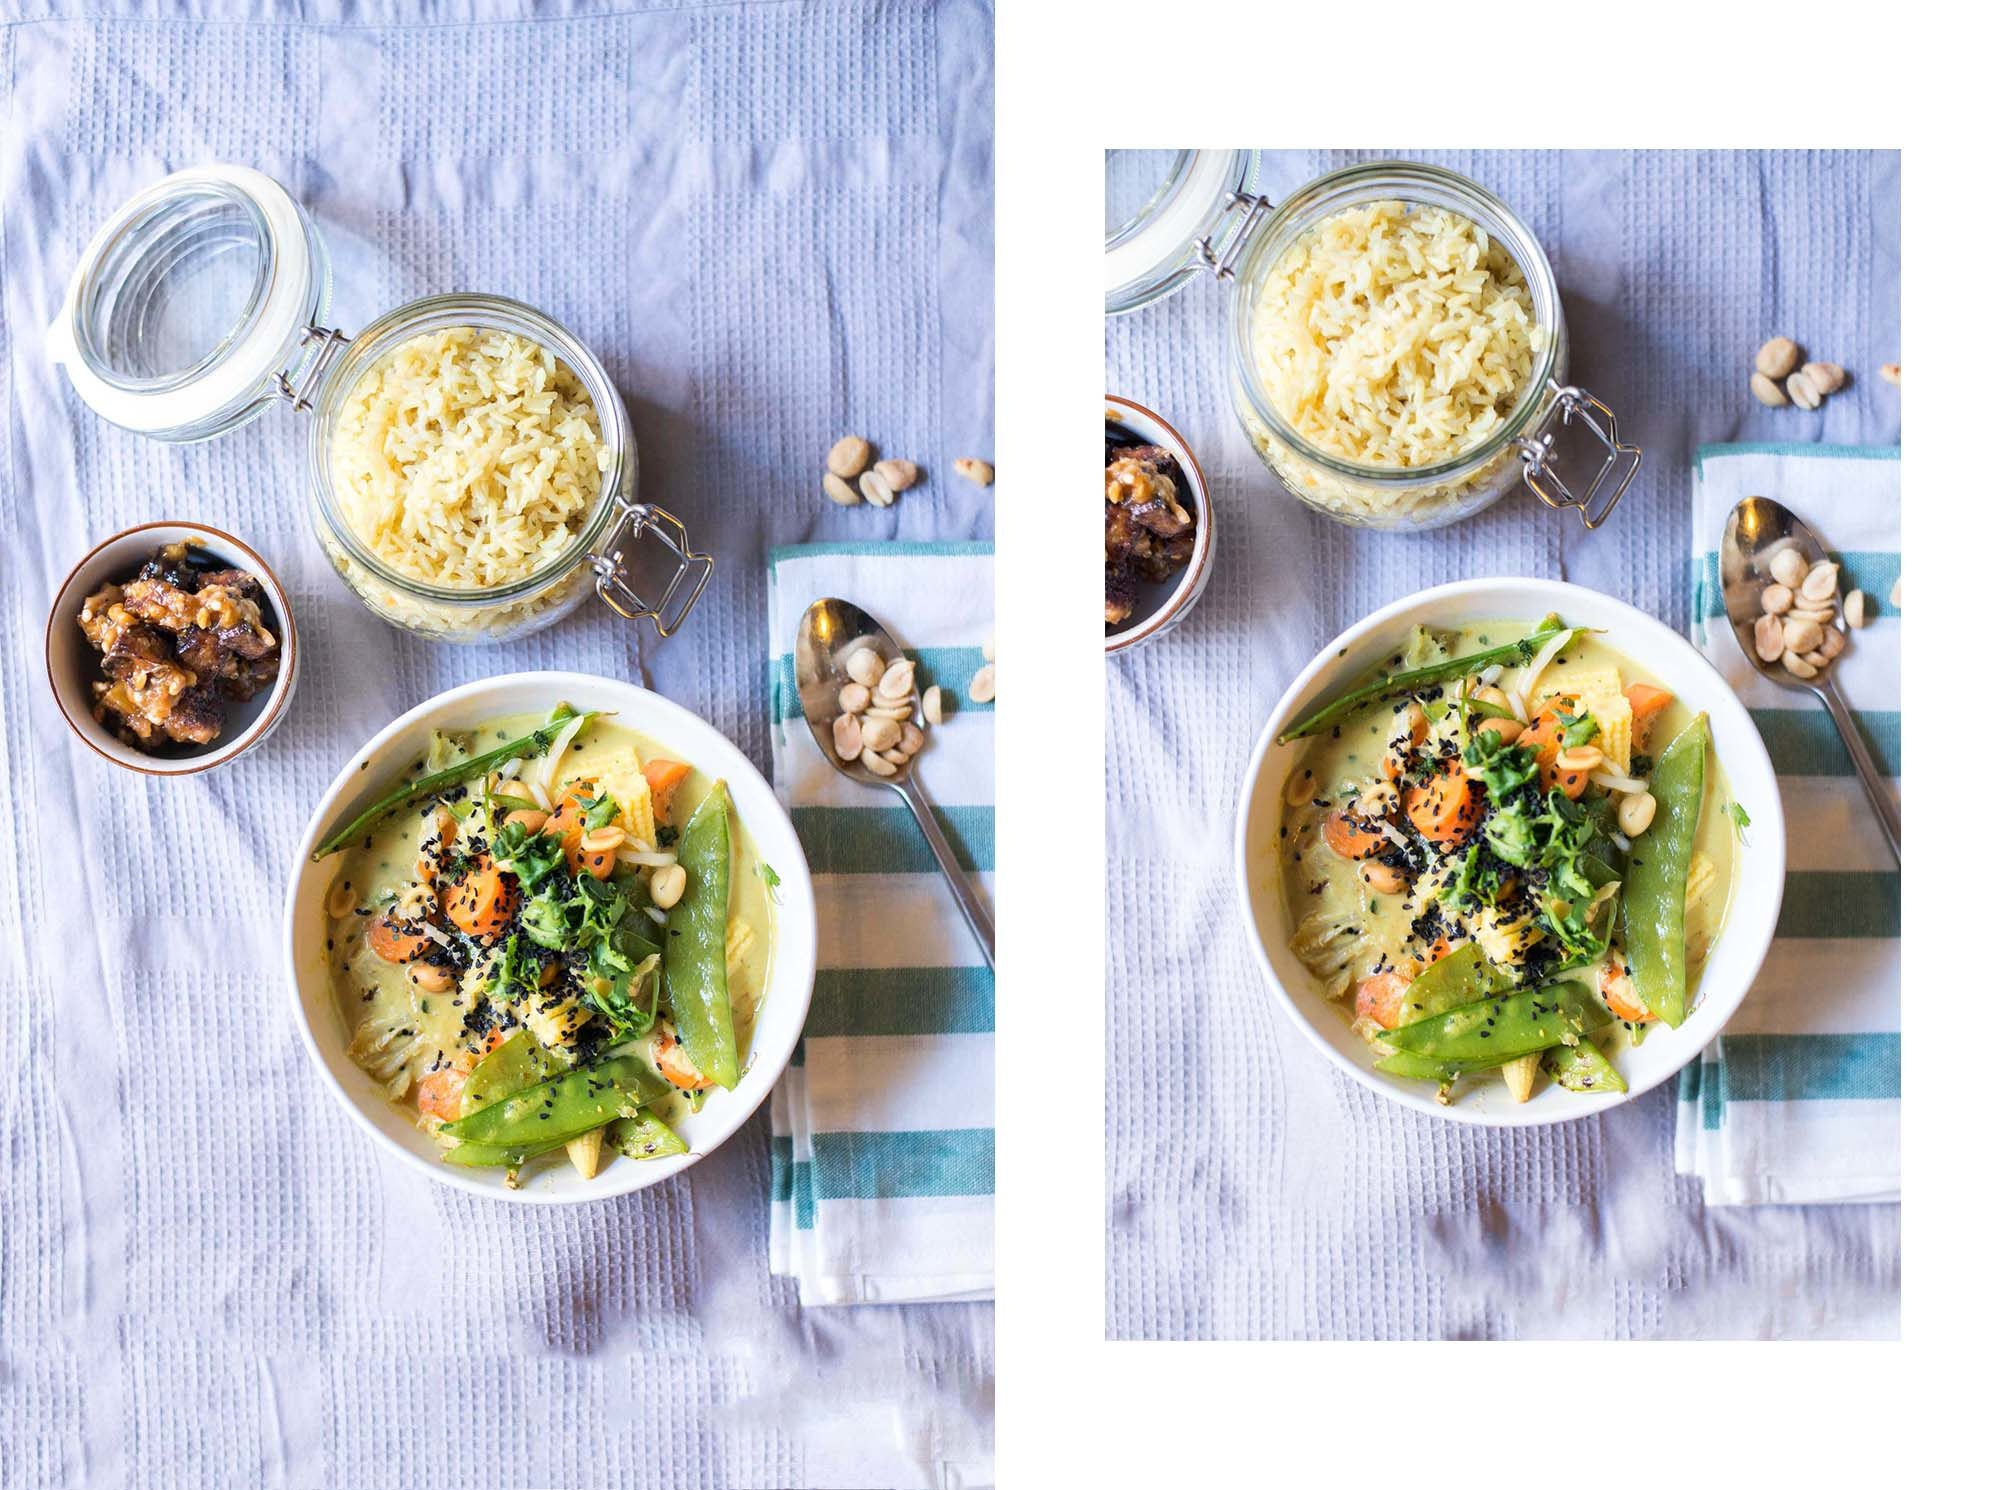 veganes thai-inspiriertes gemüsecurry Reis Tofu Erdnusbutter dogdays of summer blog vintage onlienshop graz